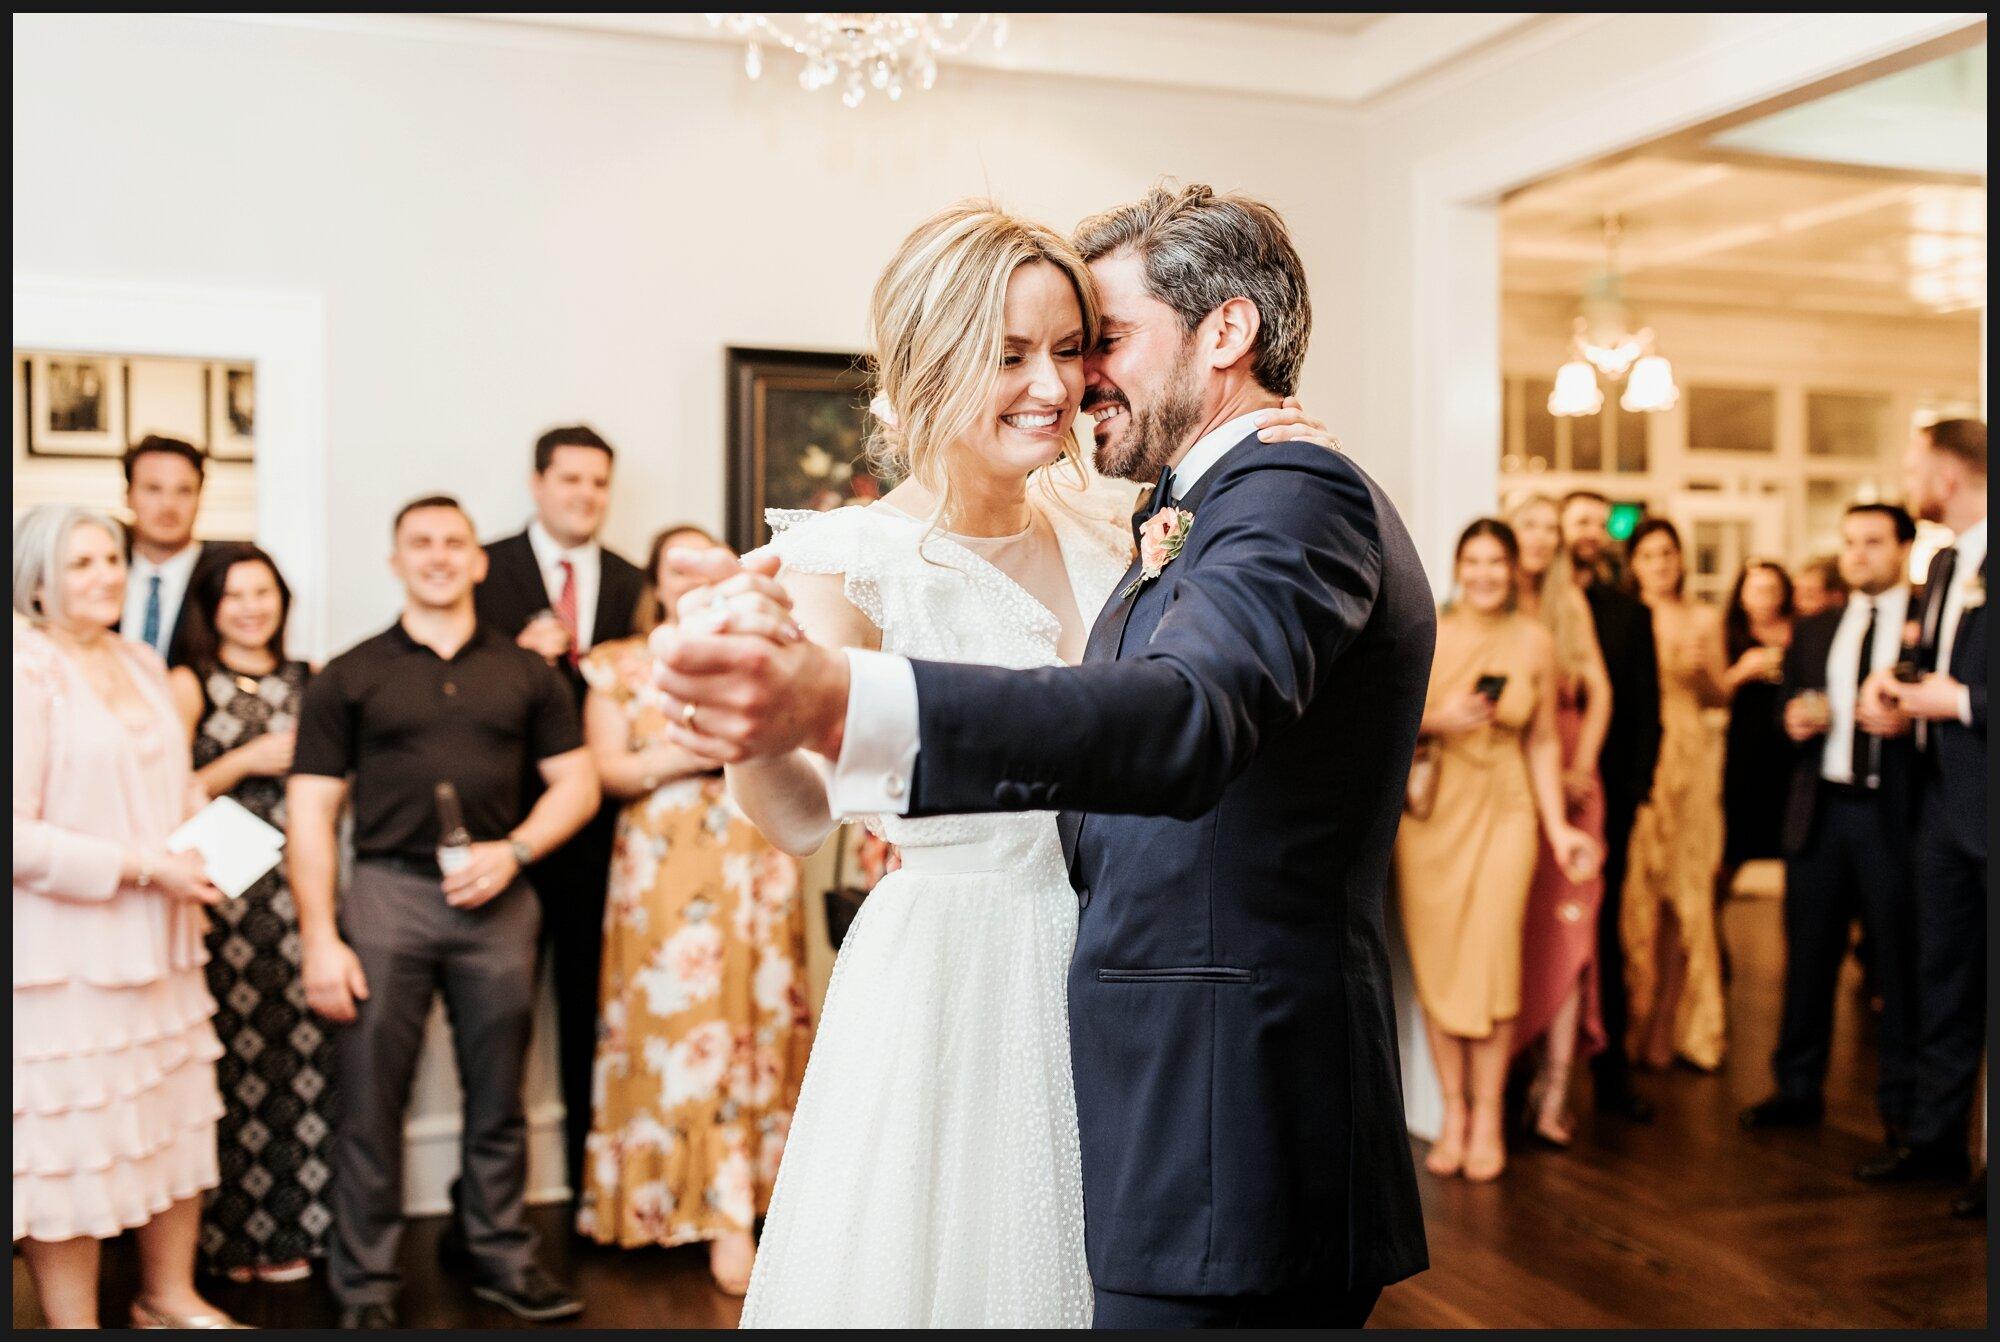 Orlando-Wedding-Photographer-destination-wedding-photographer-florida-wedding-photographer-hawaii-wedding-photographer_0767.jpg